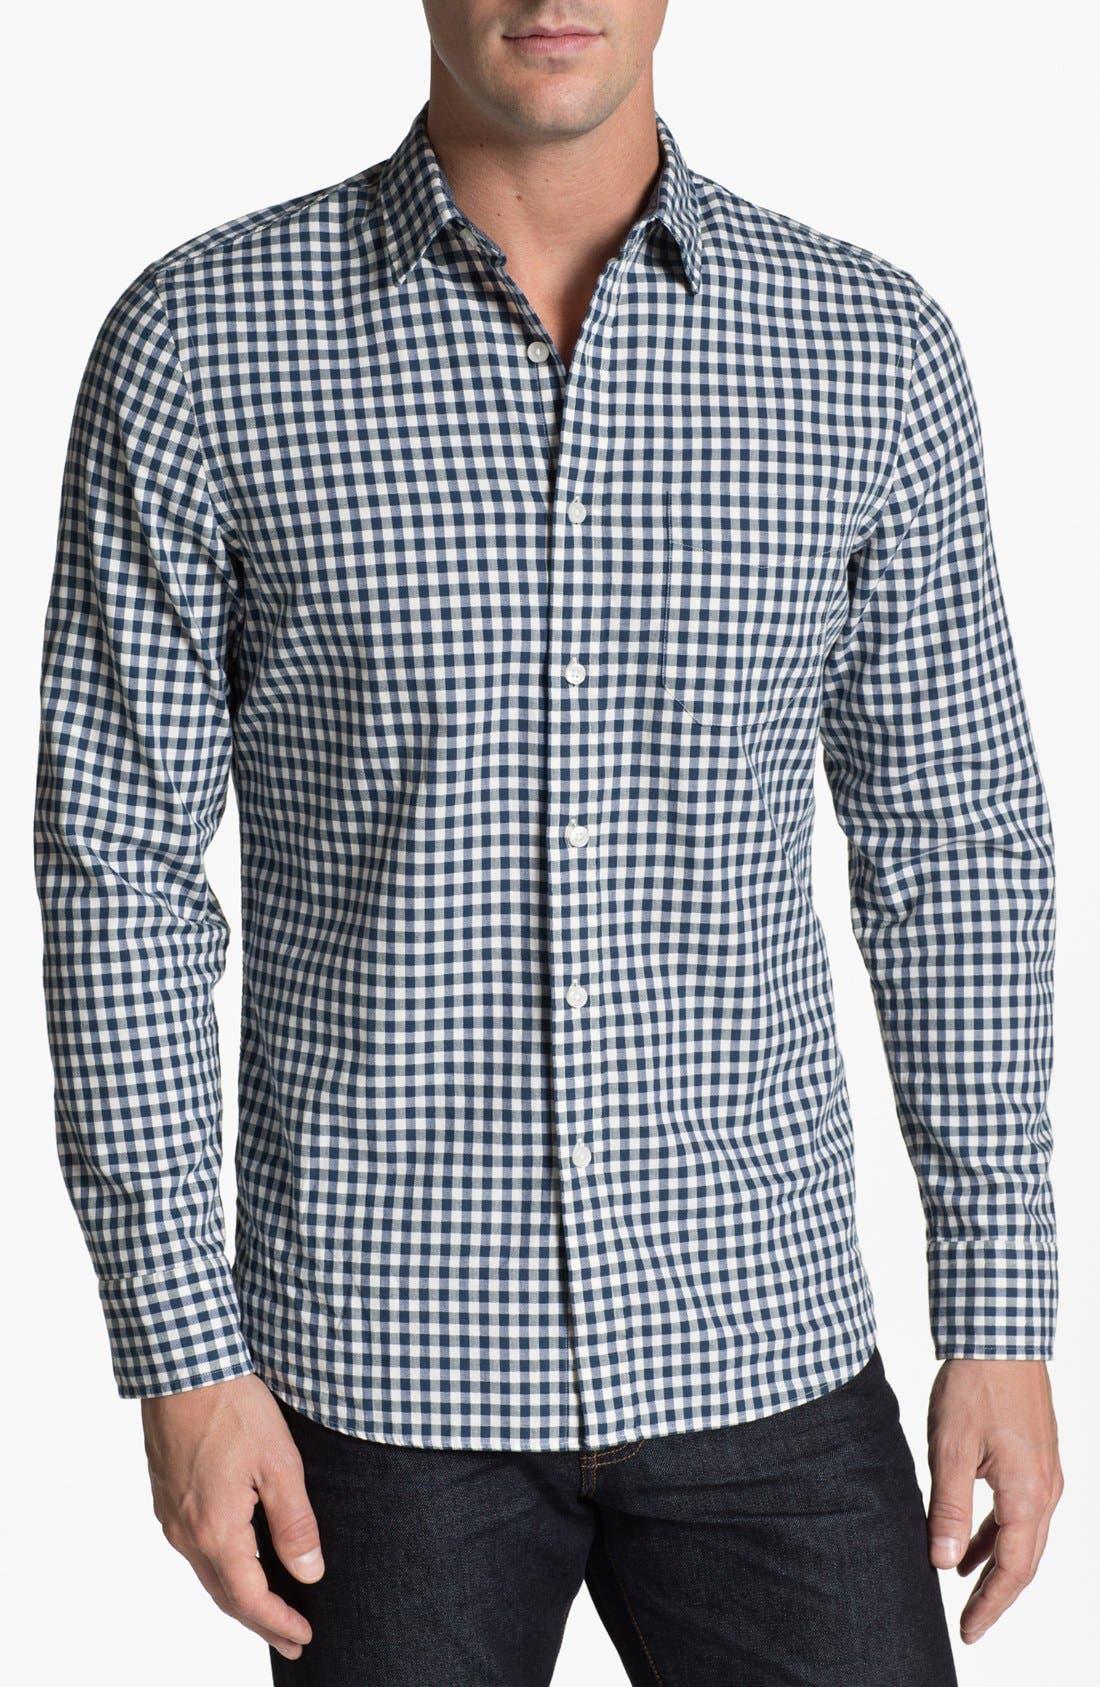 Alternate Image 1 Selected - Wallin & Bros. Gingham Trim Fit Sport Shirt